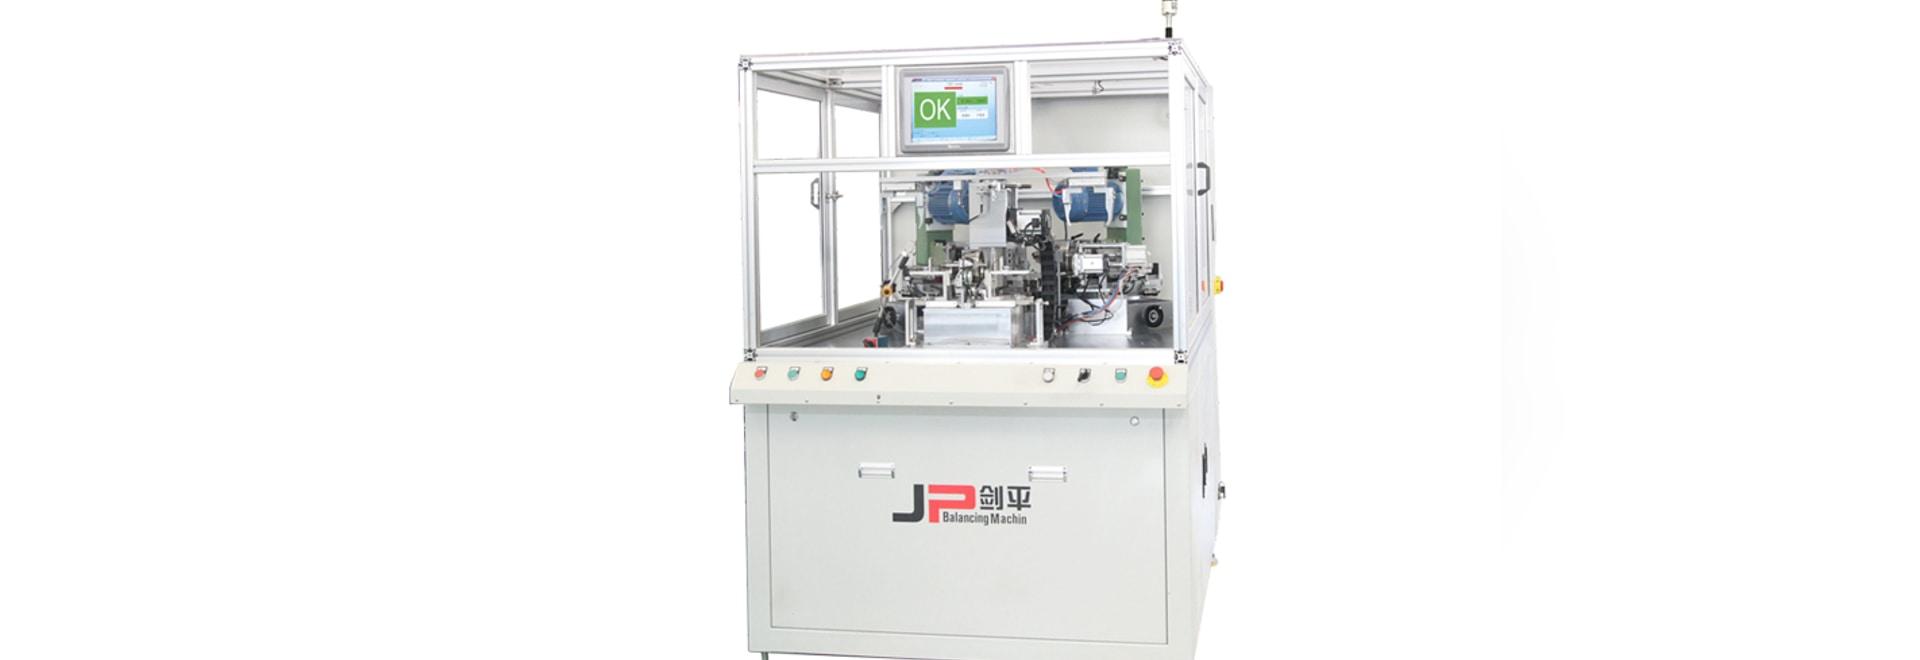 Generator Rotor Automatic Balancing Machine